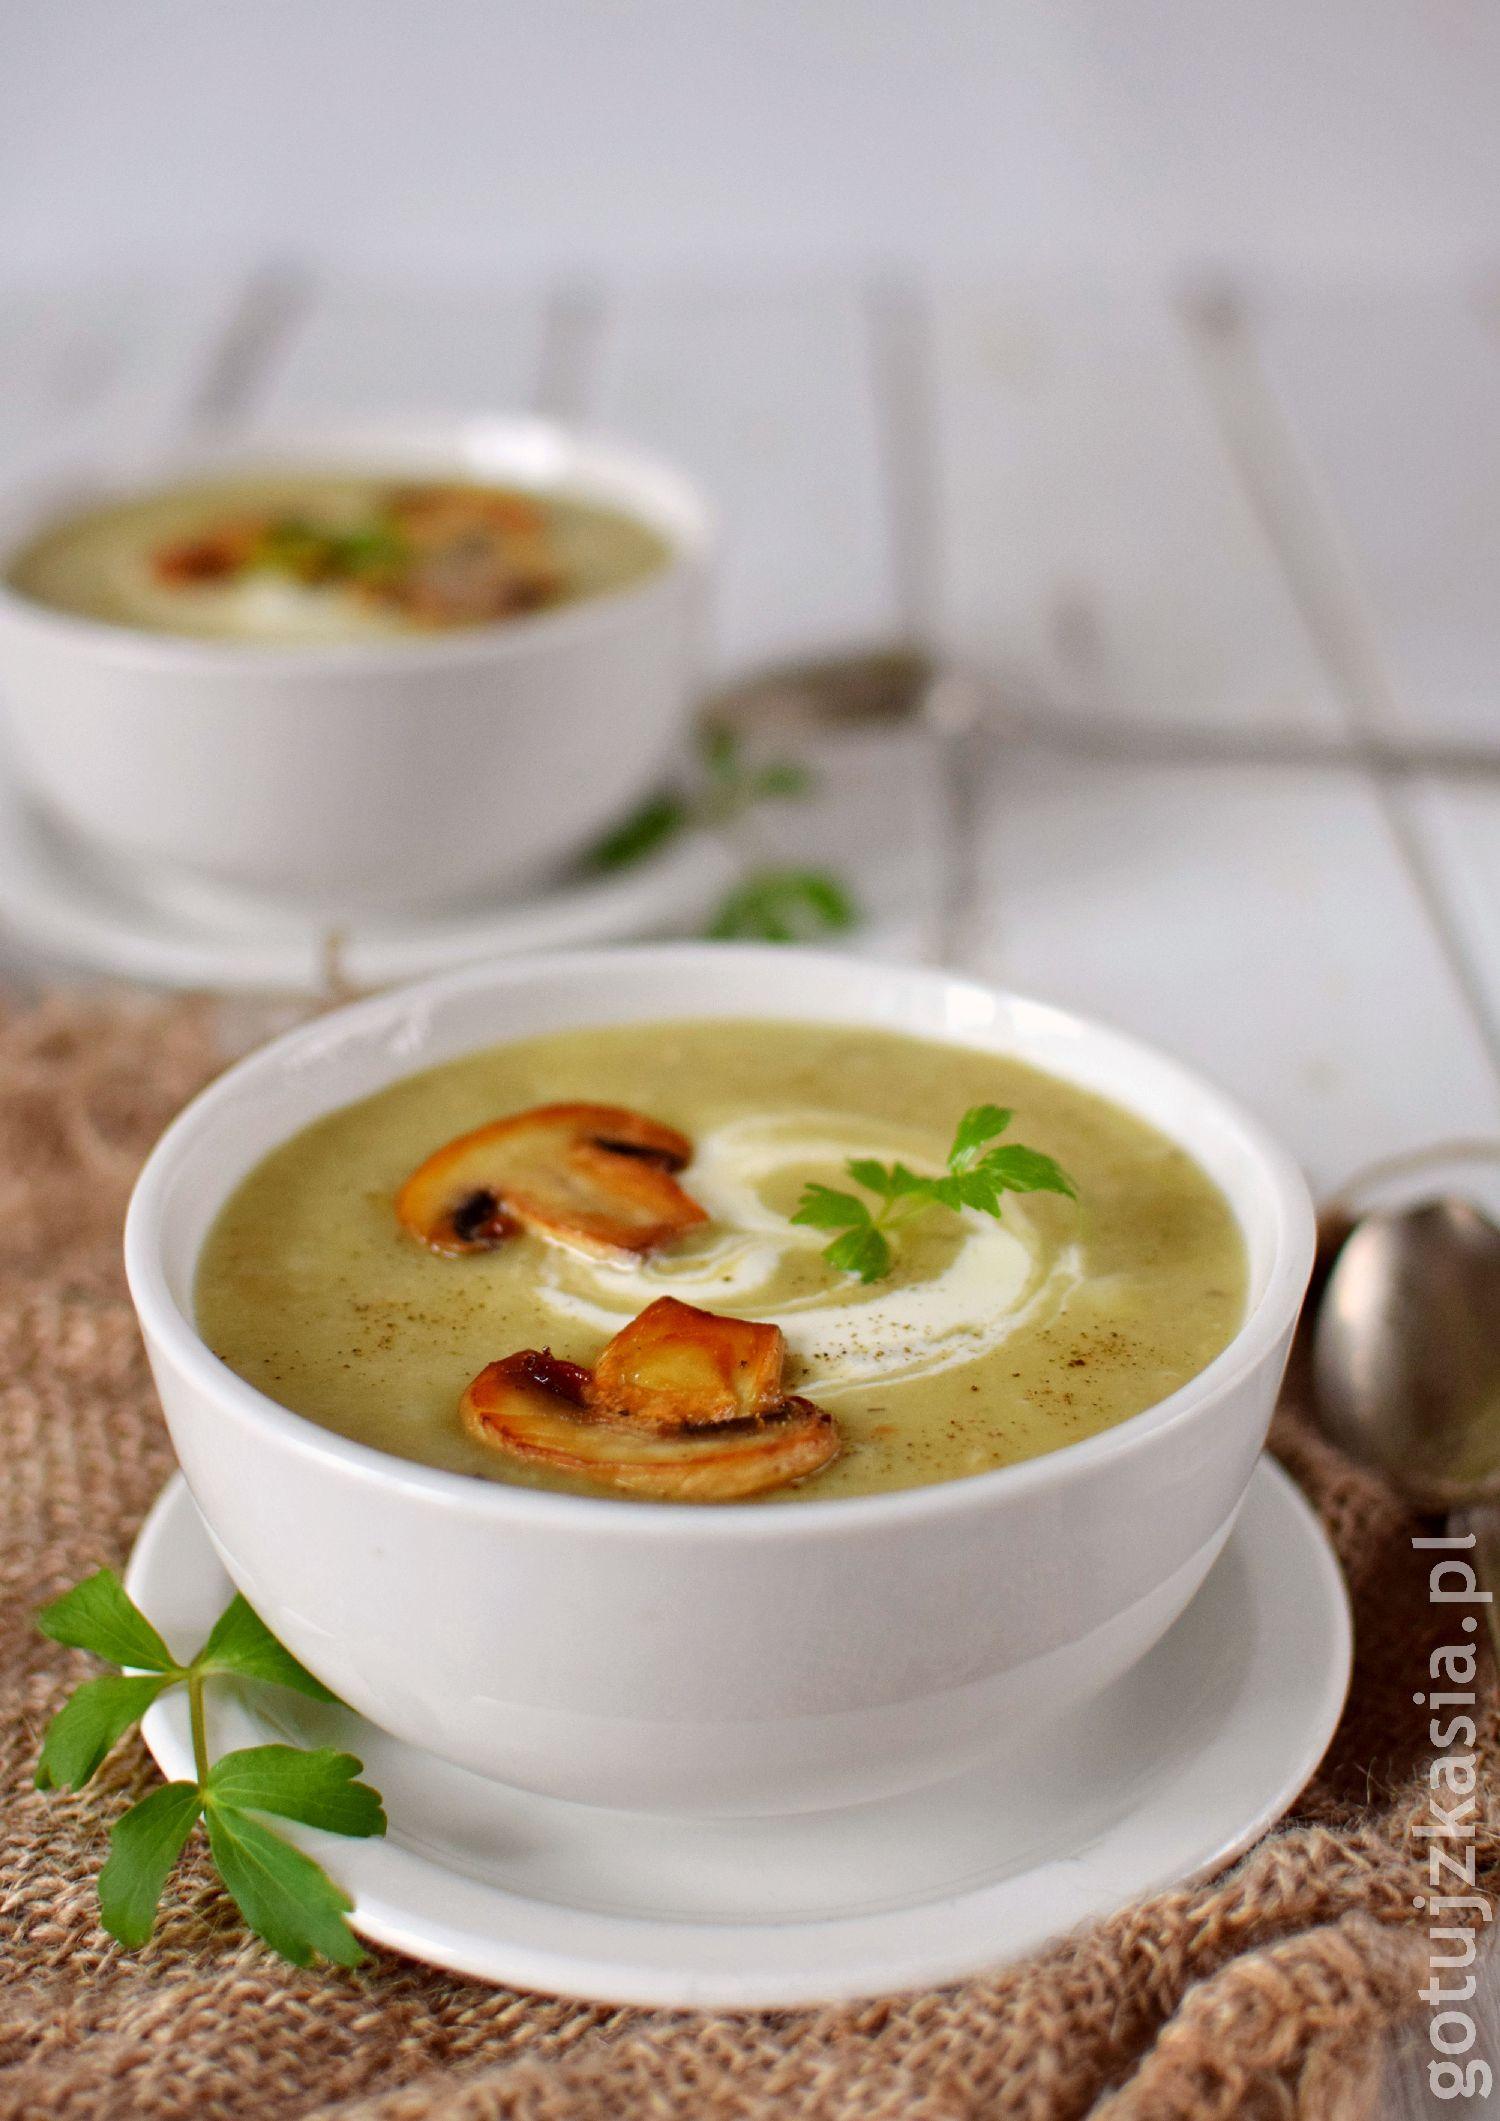 Sieradz_zupa z topinamburem 3